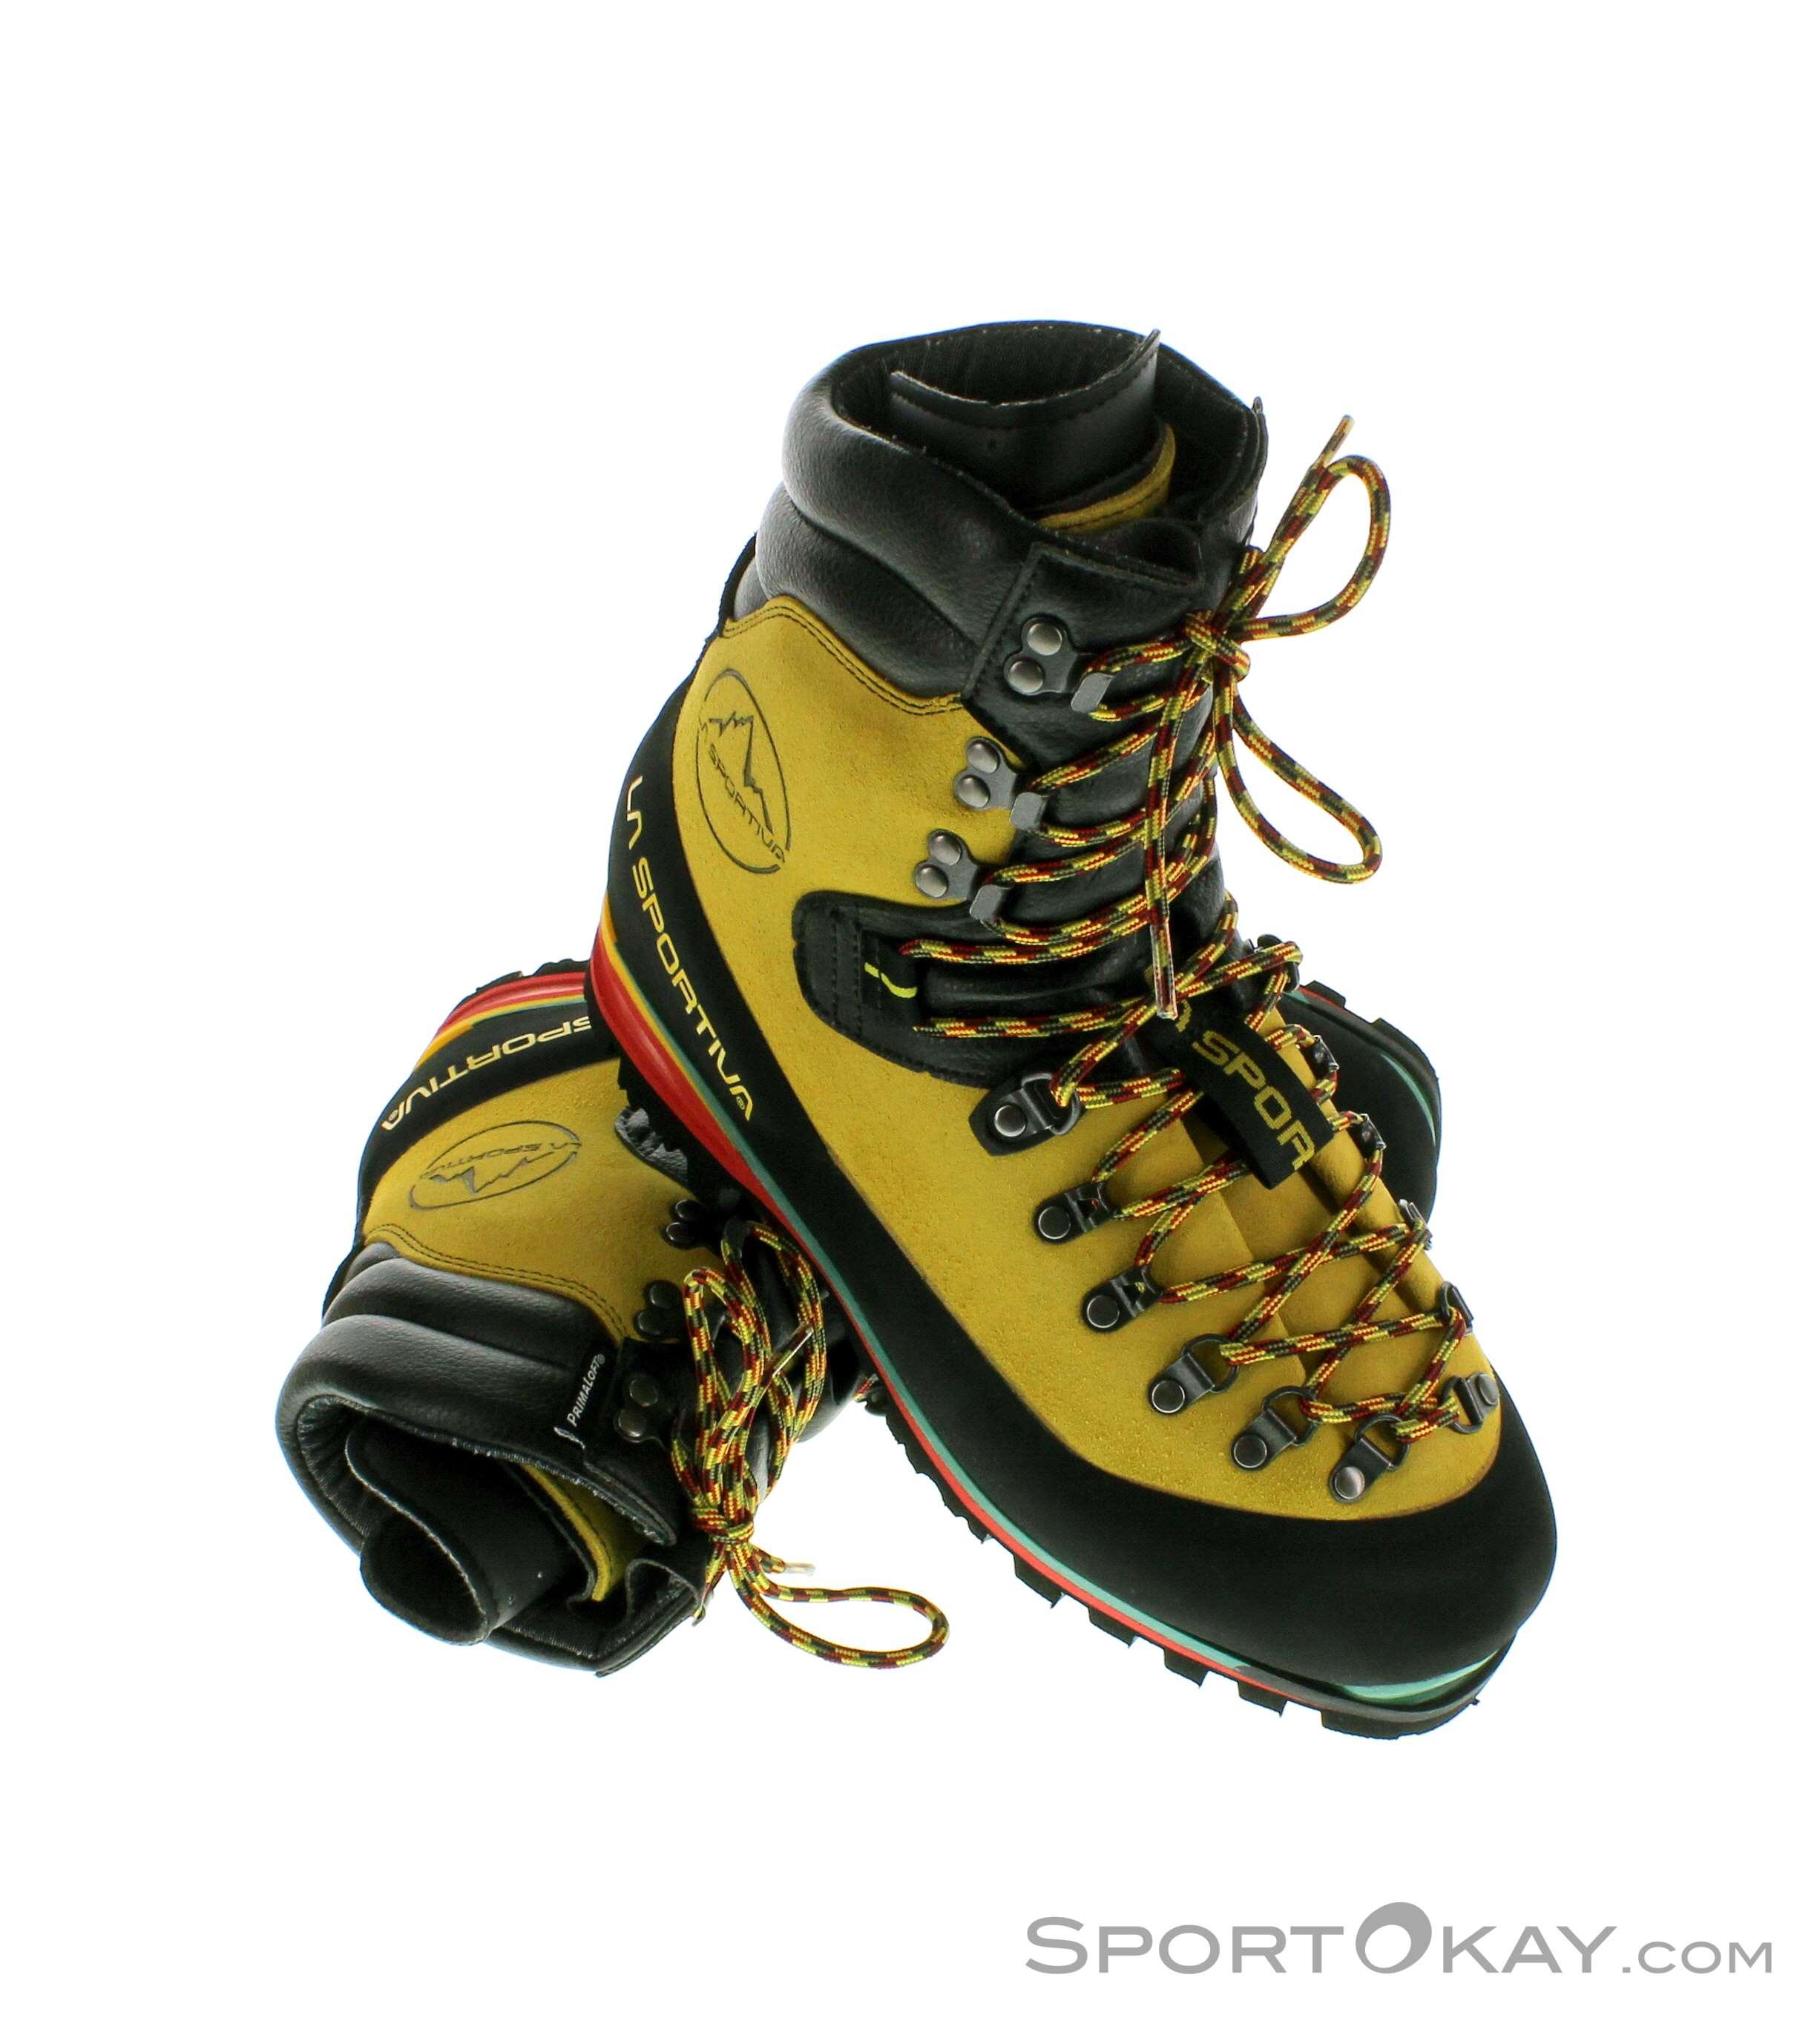 La Sportiva Nepal Extreme Uomo Scarpe da Montagna - Scarpe da ... 595a7067bf3